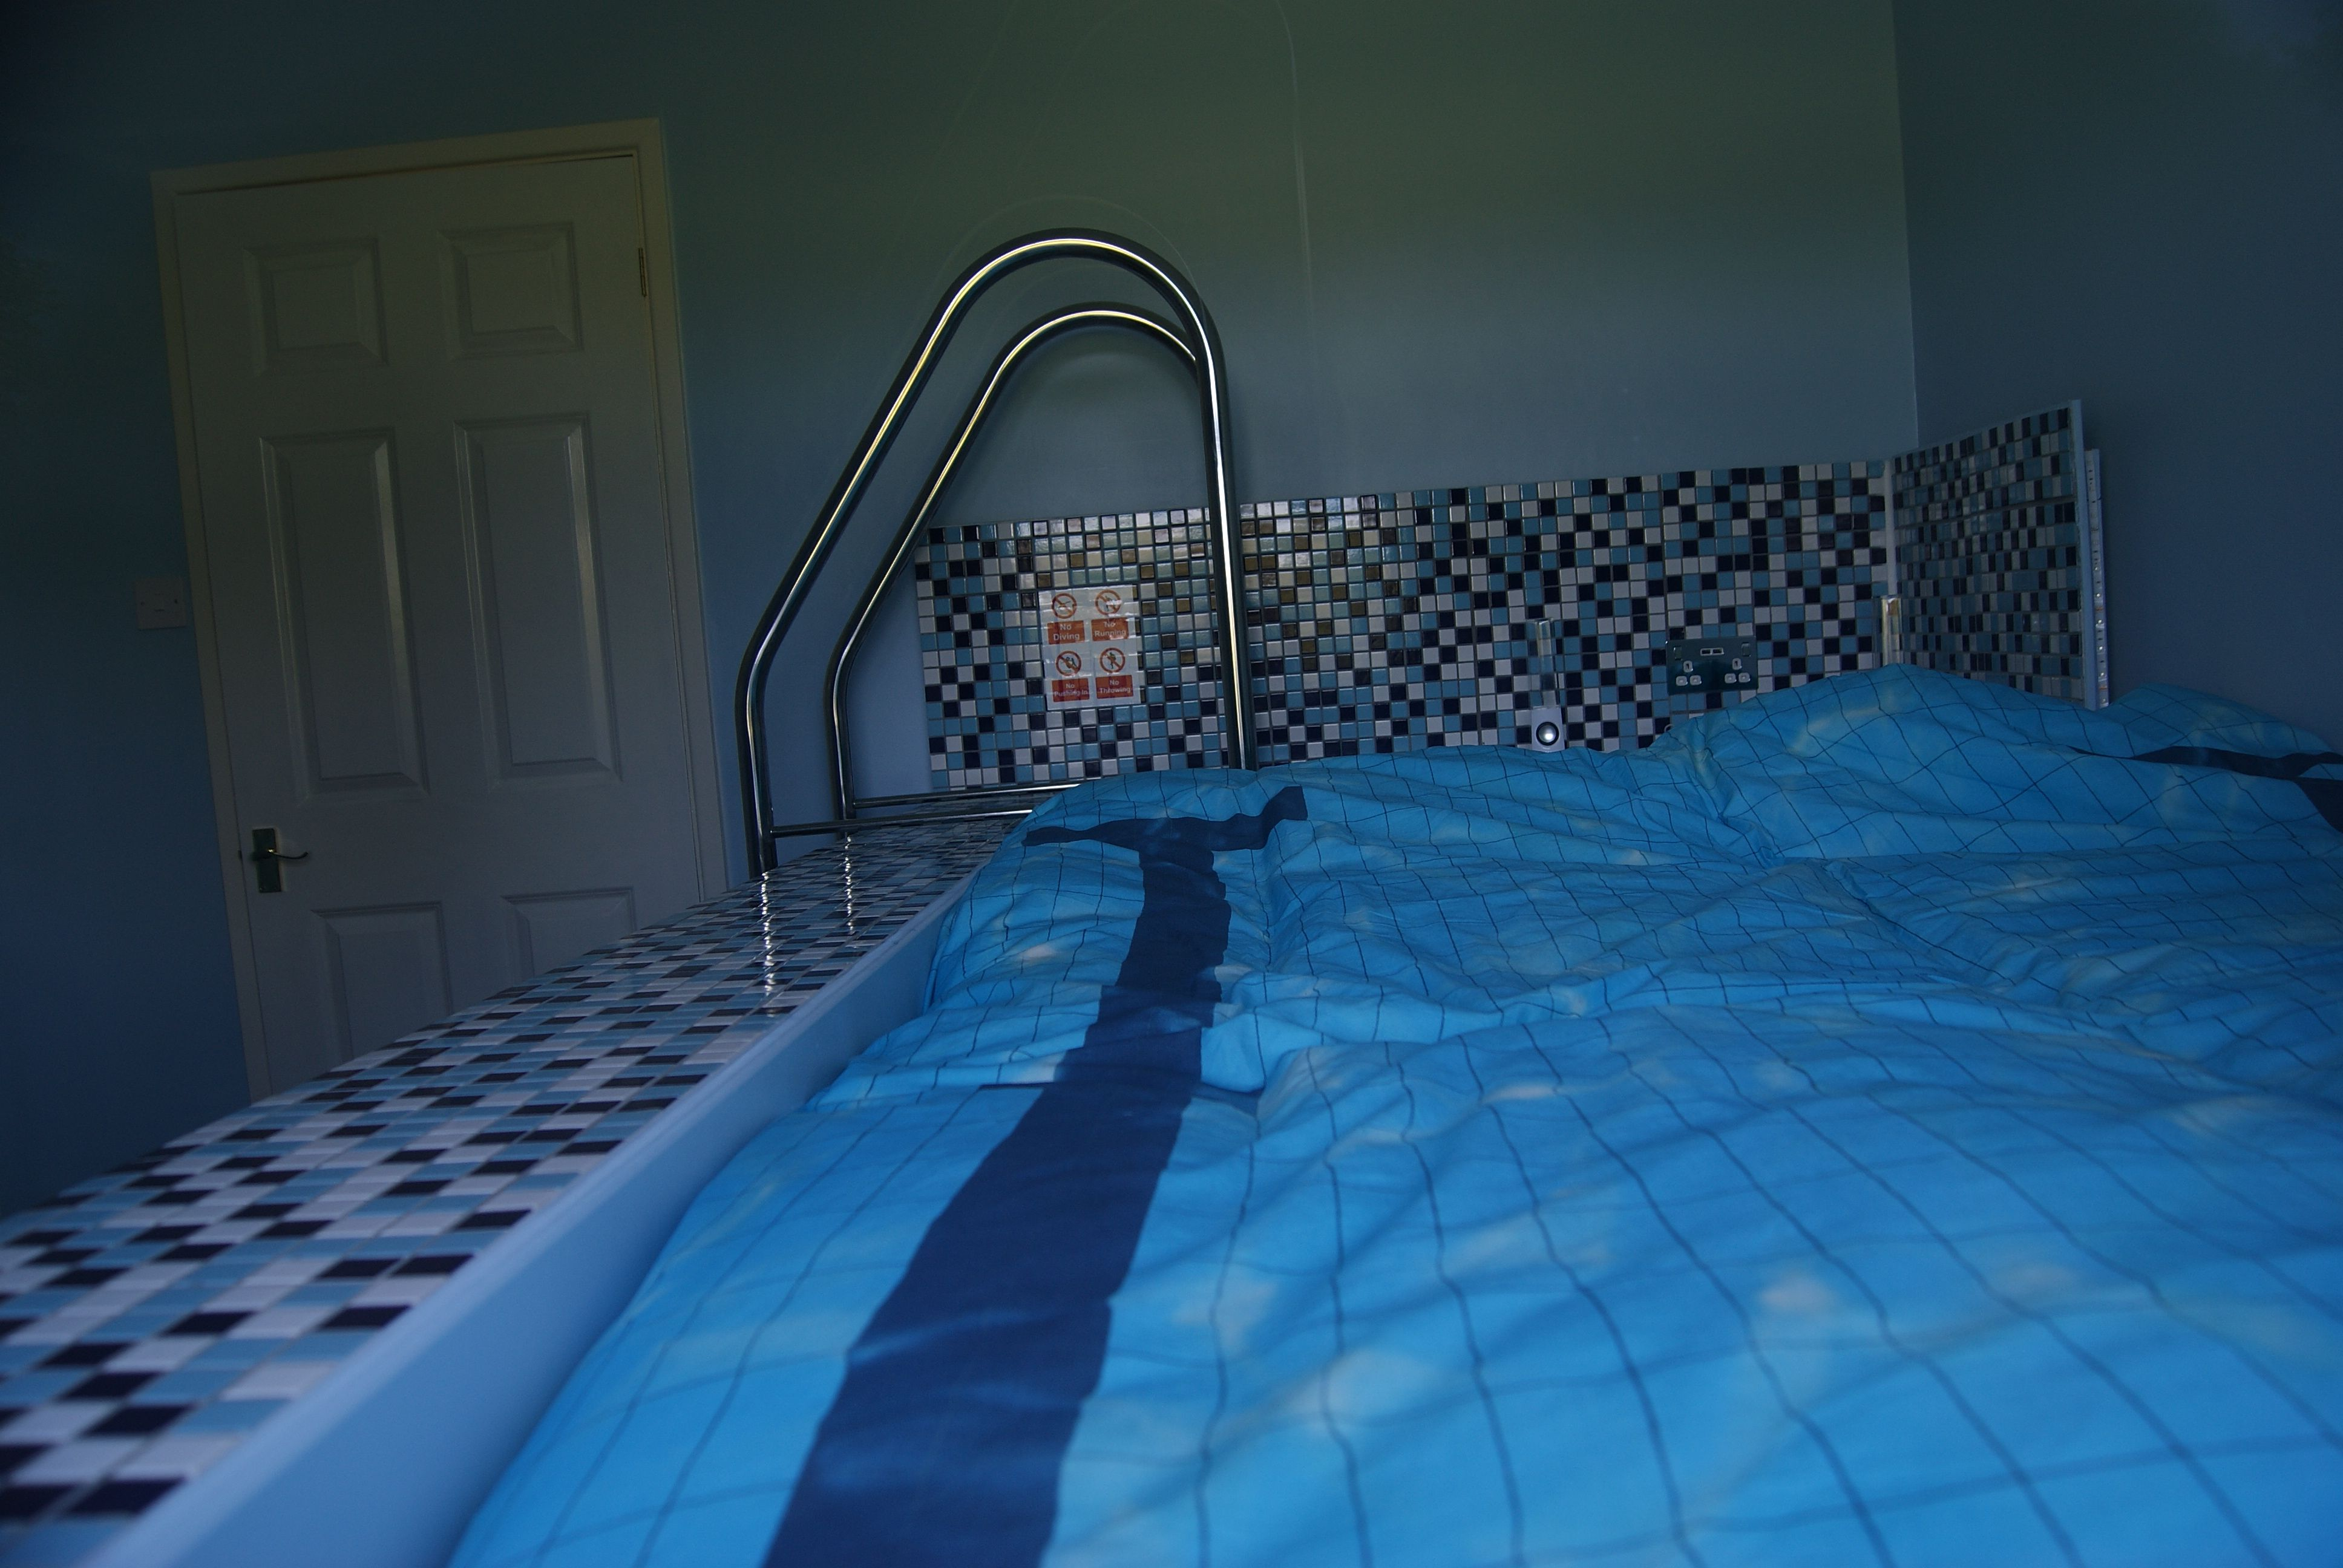 Swimming Pool Bed With Pool Steps Snurk Beddengoed Duvet